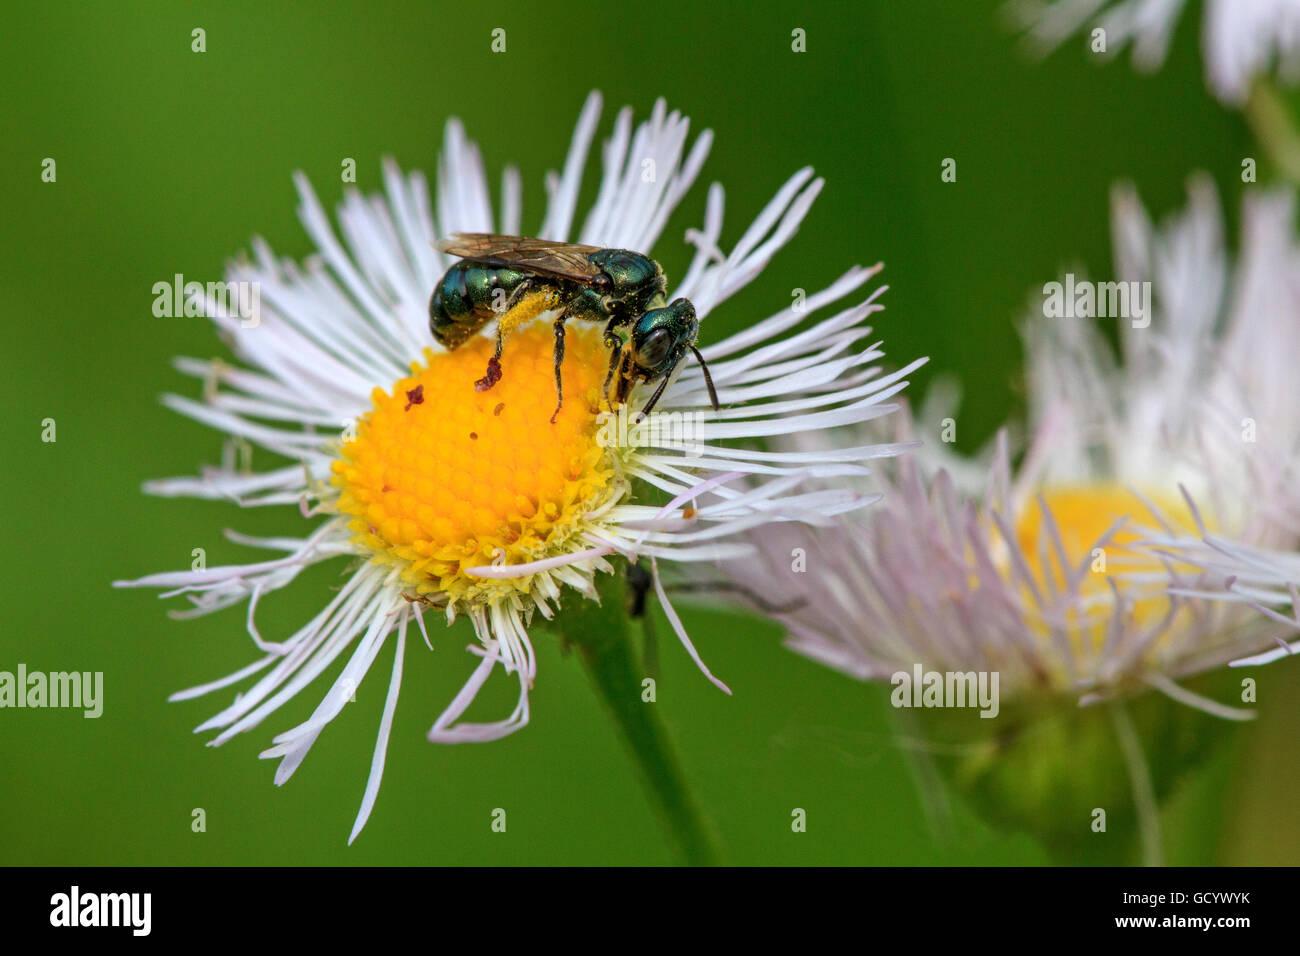 Daisy fleabane (Erigeron philadelphicus) with metallic sweat bee (Halictidae sp.) - Stock Image